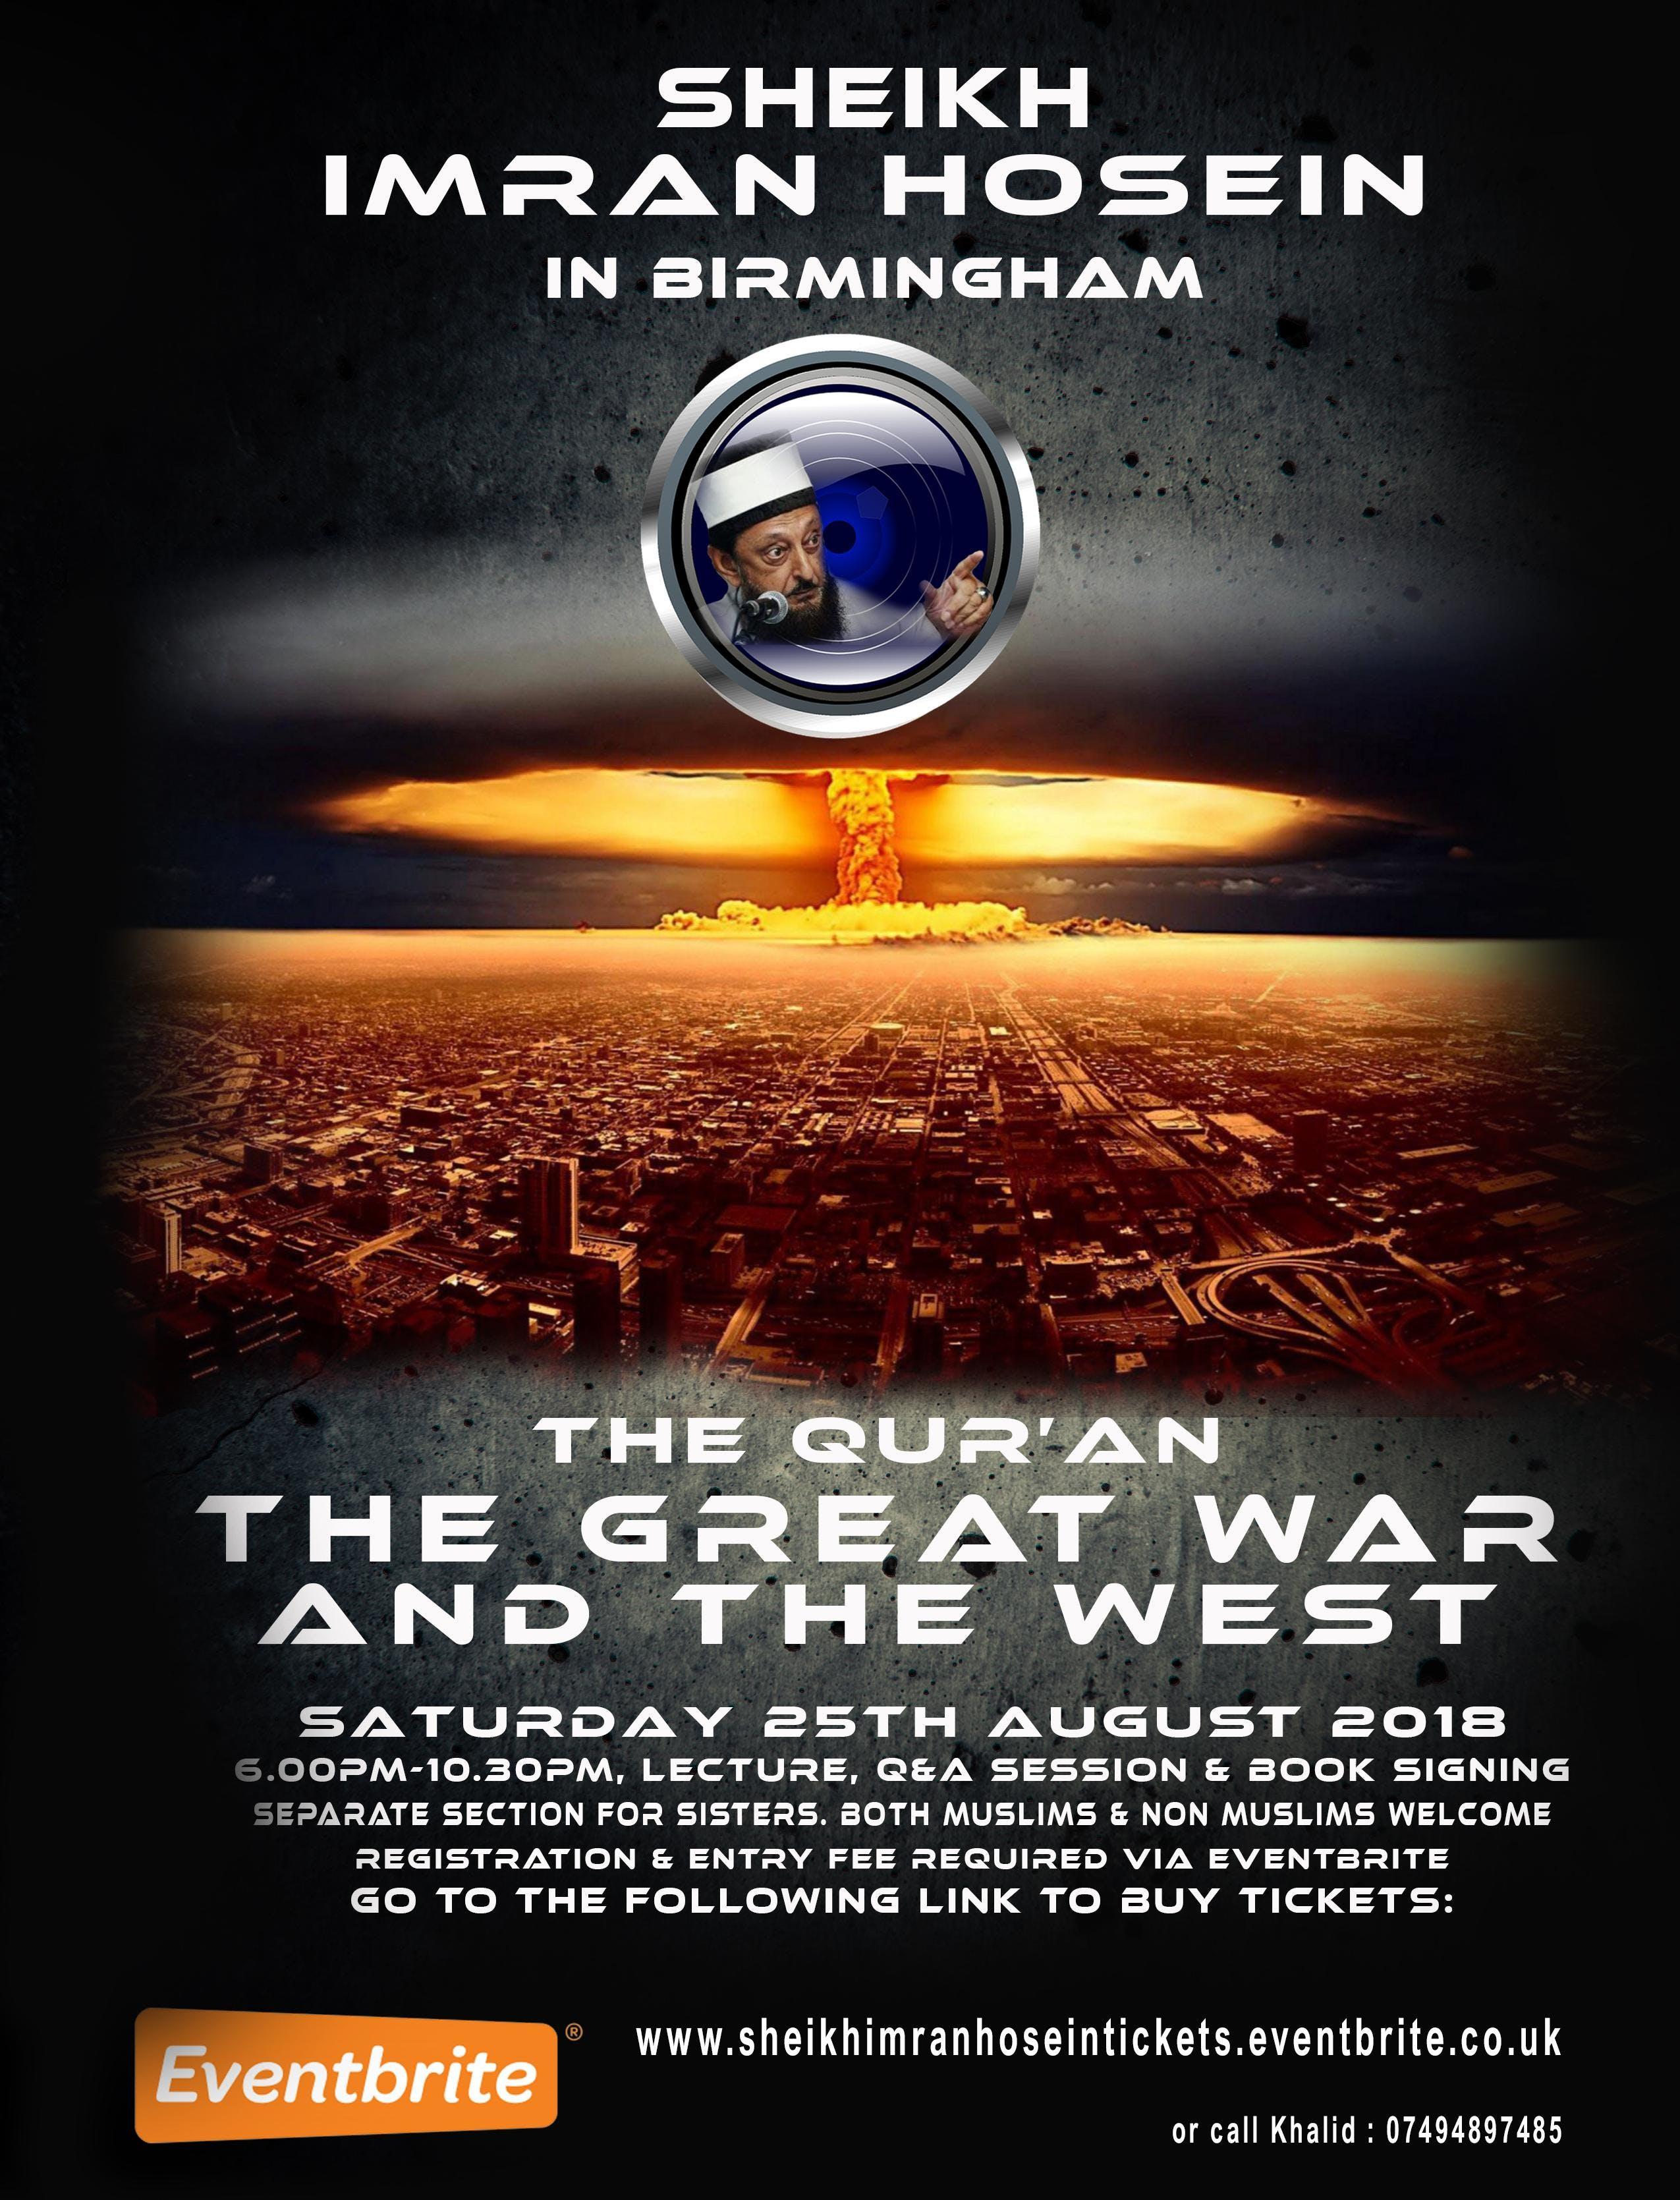 Sheikh Imran Hosein In Birmingham - The Quran, The Great War